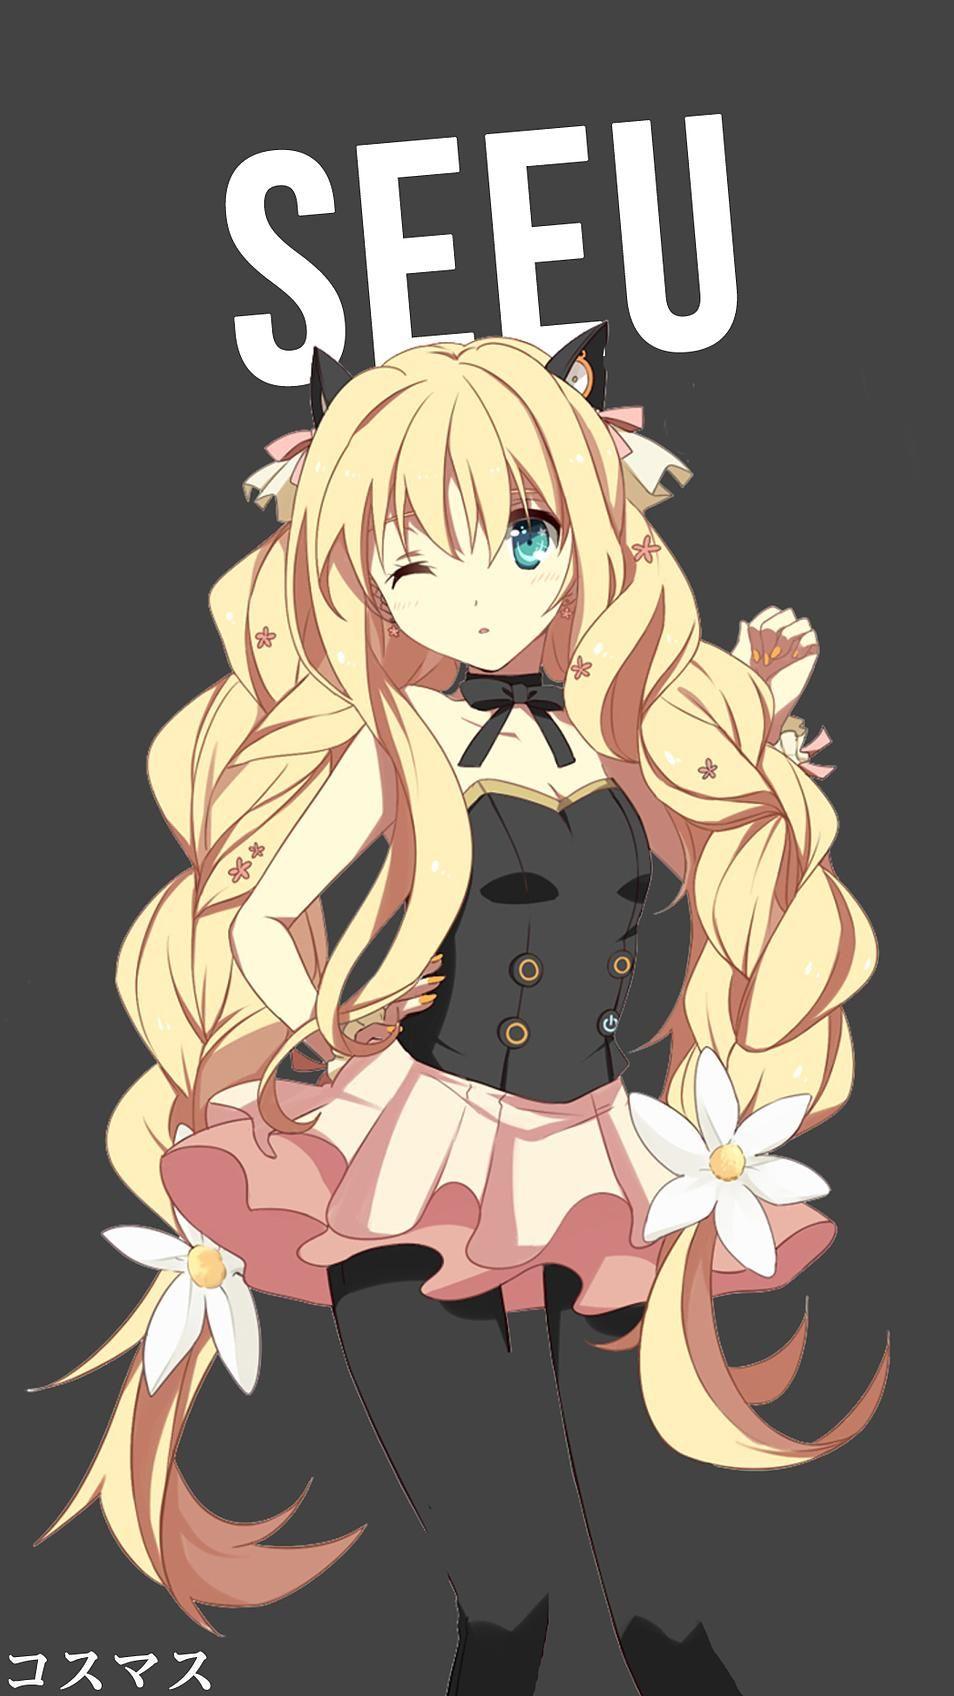 Seeu Korigengi Wallpaper Anime Anime Anime Character Names Anime Characters